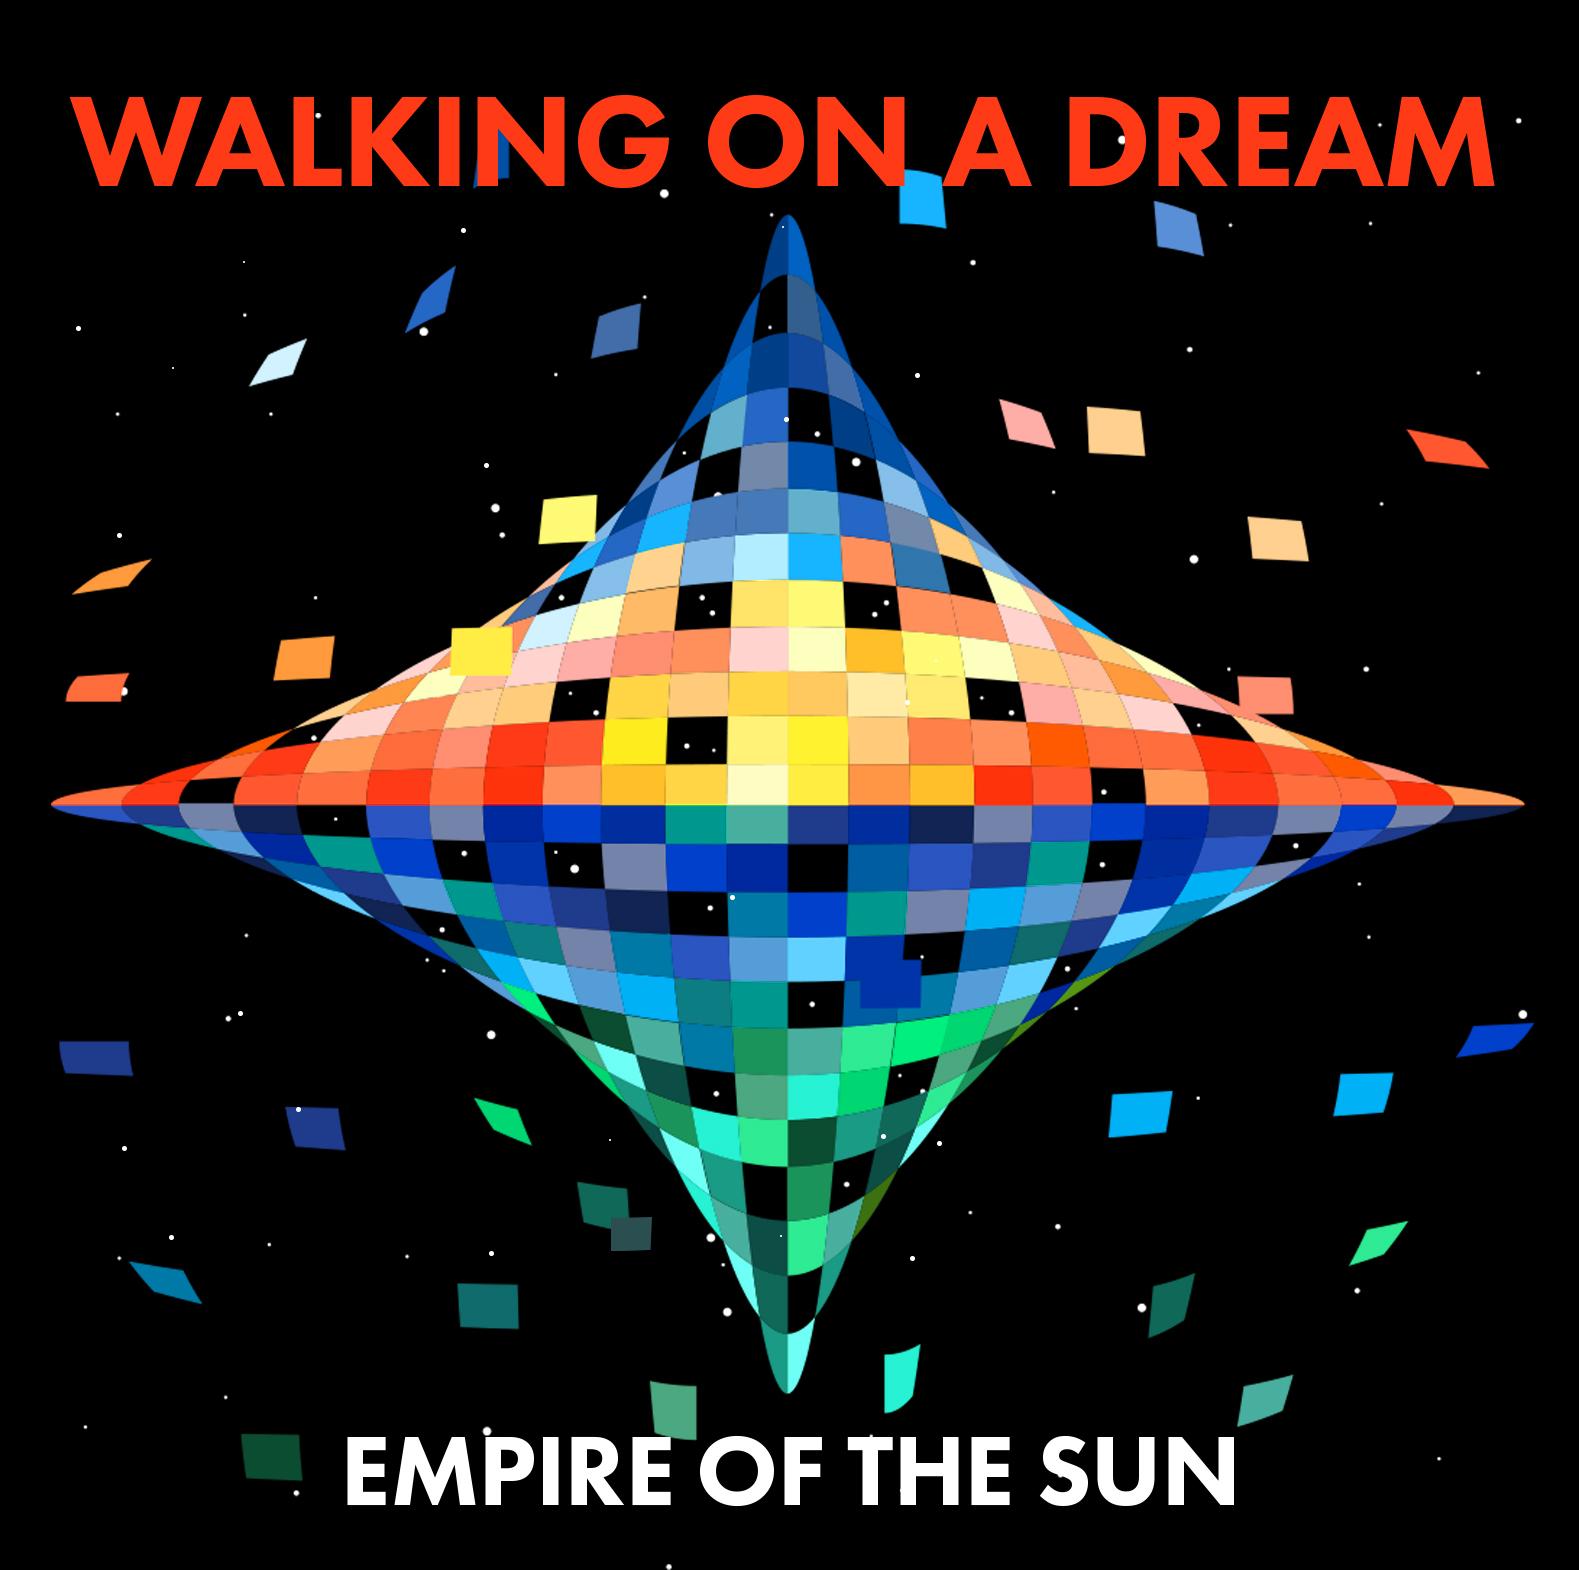 WALKING ON A DREAM MARS3LL RADIO EDIT СКАЧАТЬ БЕСПЛАТНО